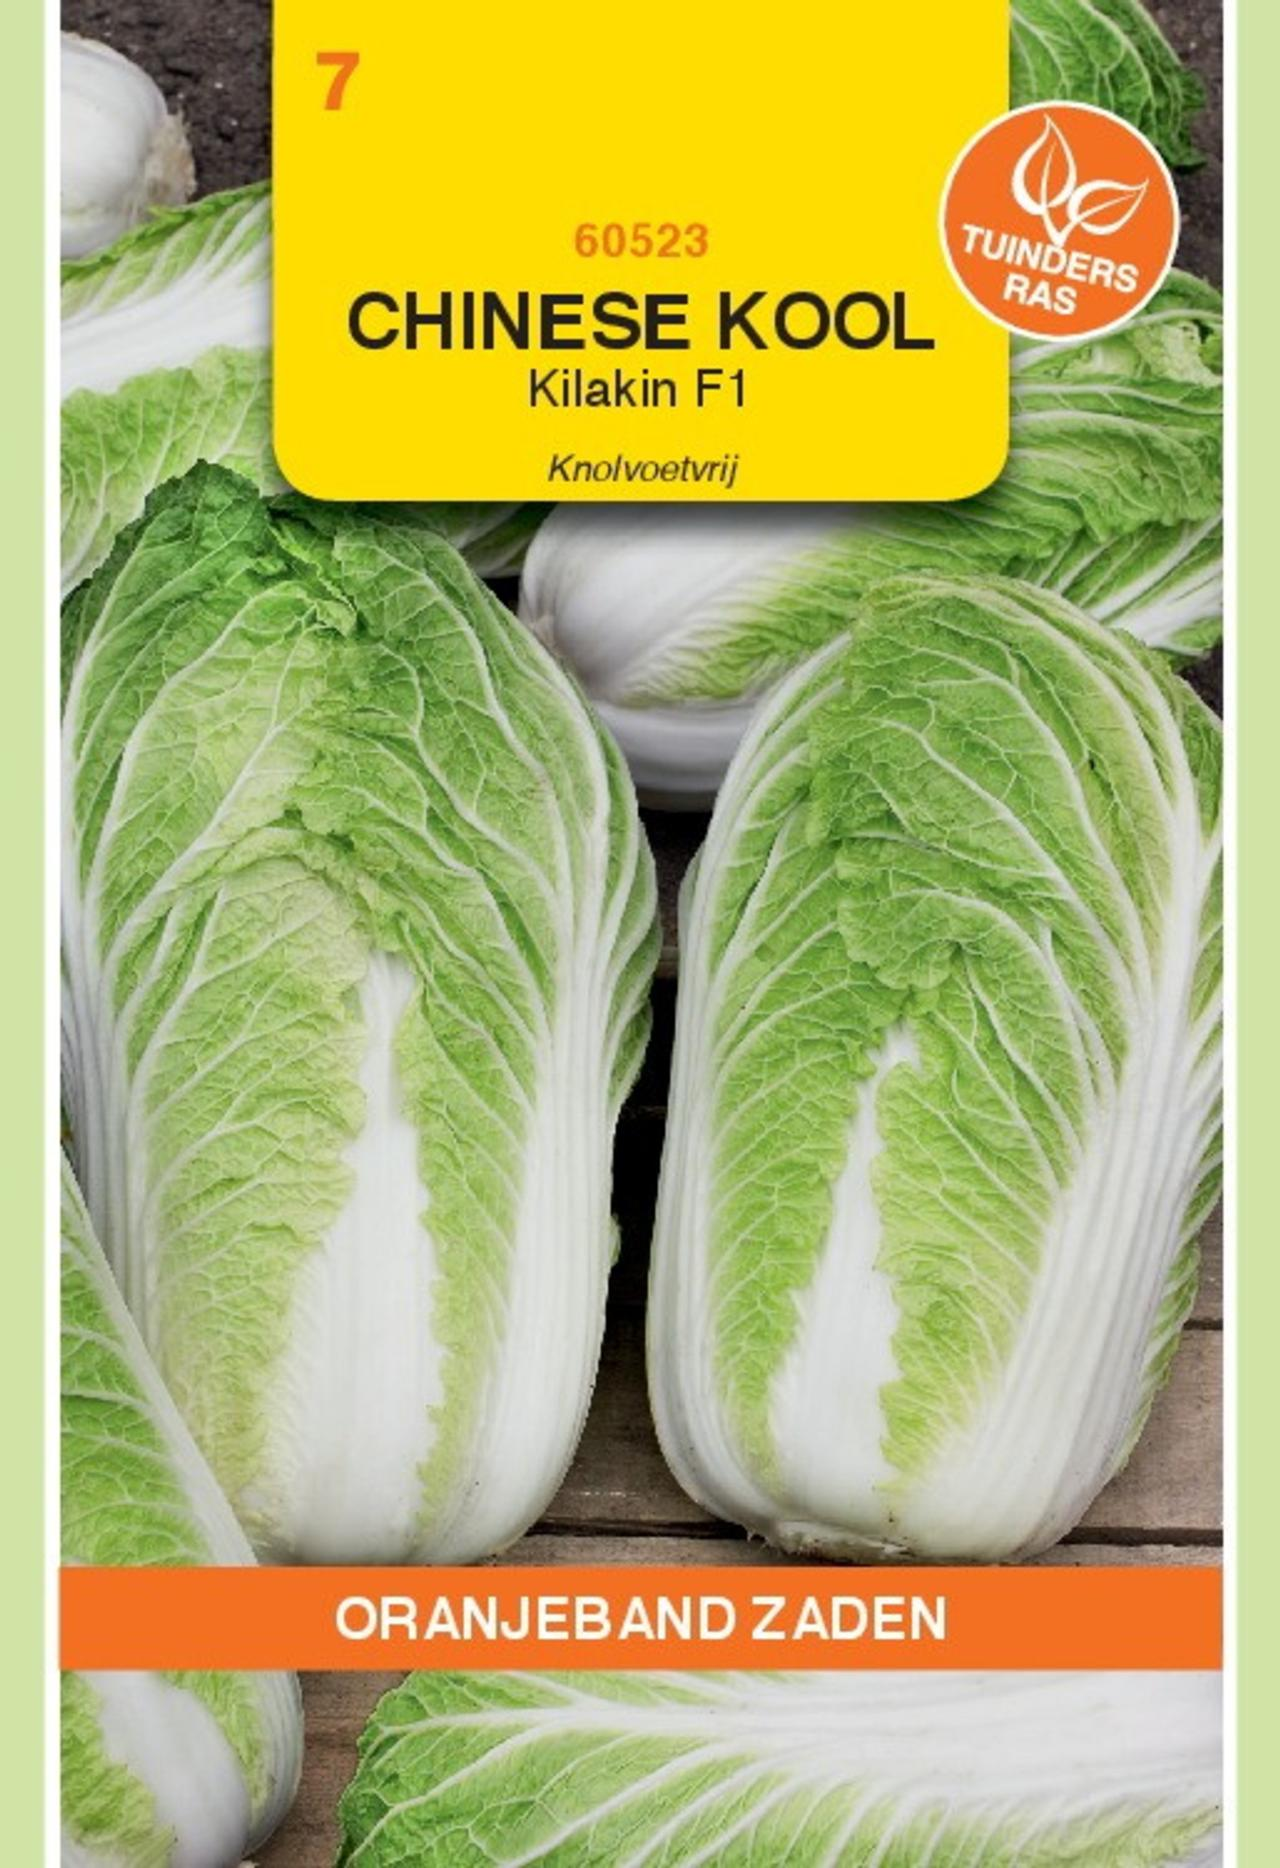 Brassica pekinensis 'Kilakin F1' plant